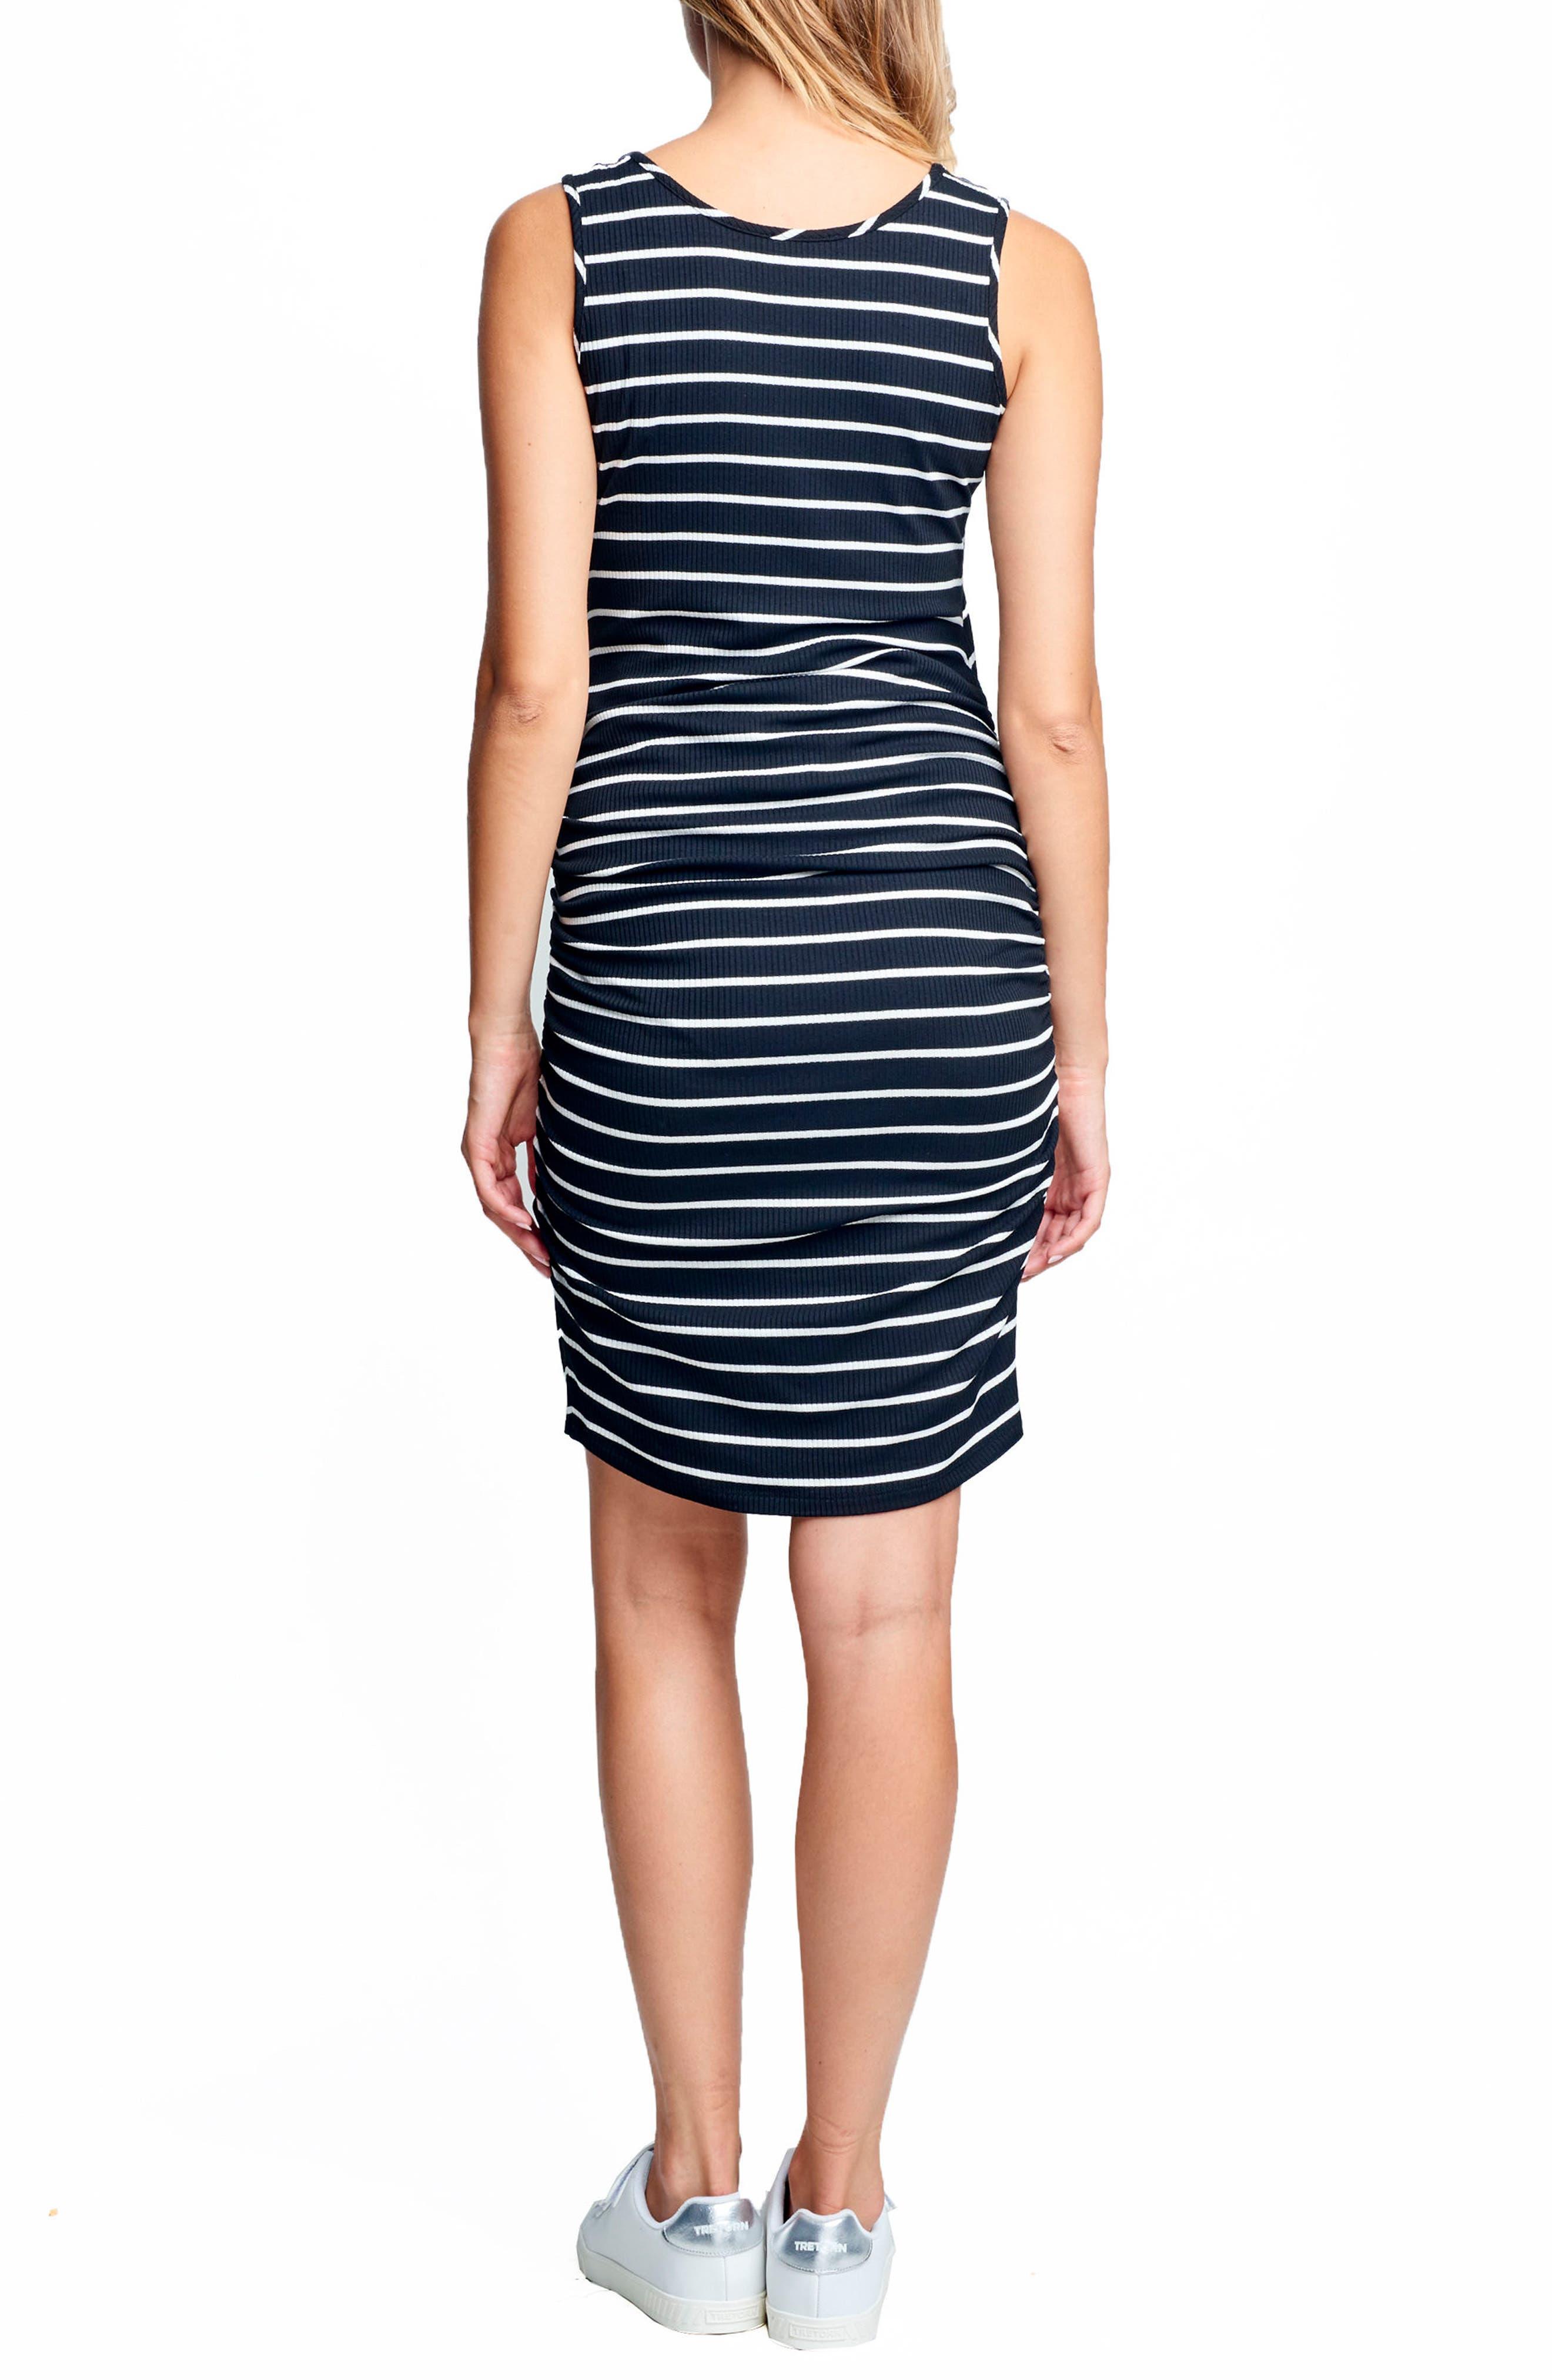 Ruched Maternity/Nursing Dress,                             Alternate thumbnail 2, color,                             BLACK/ WHITE STRIPE